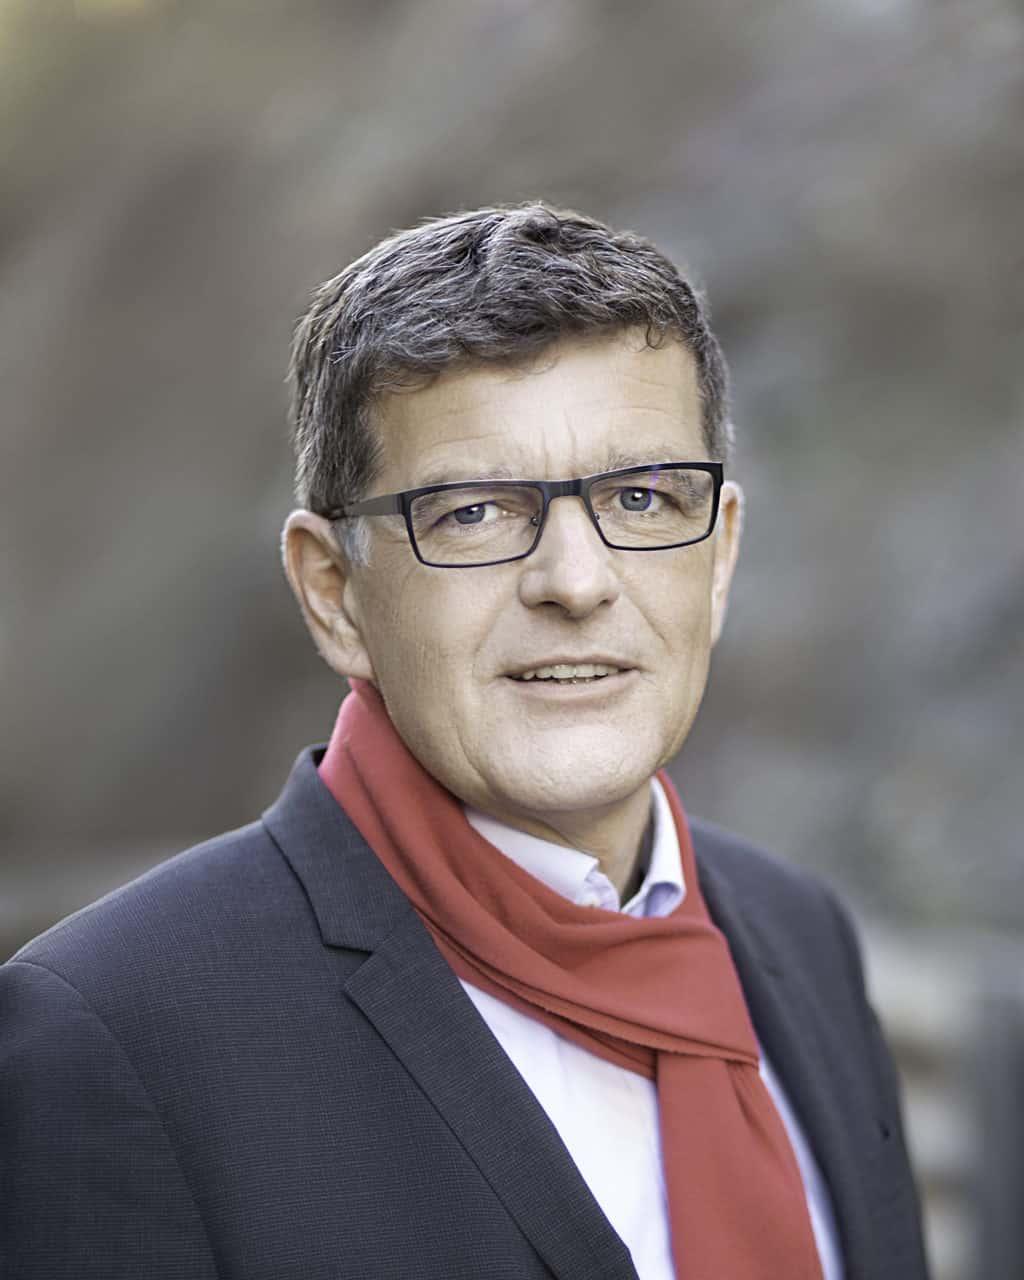 Michael Höllmann